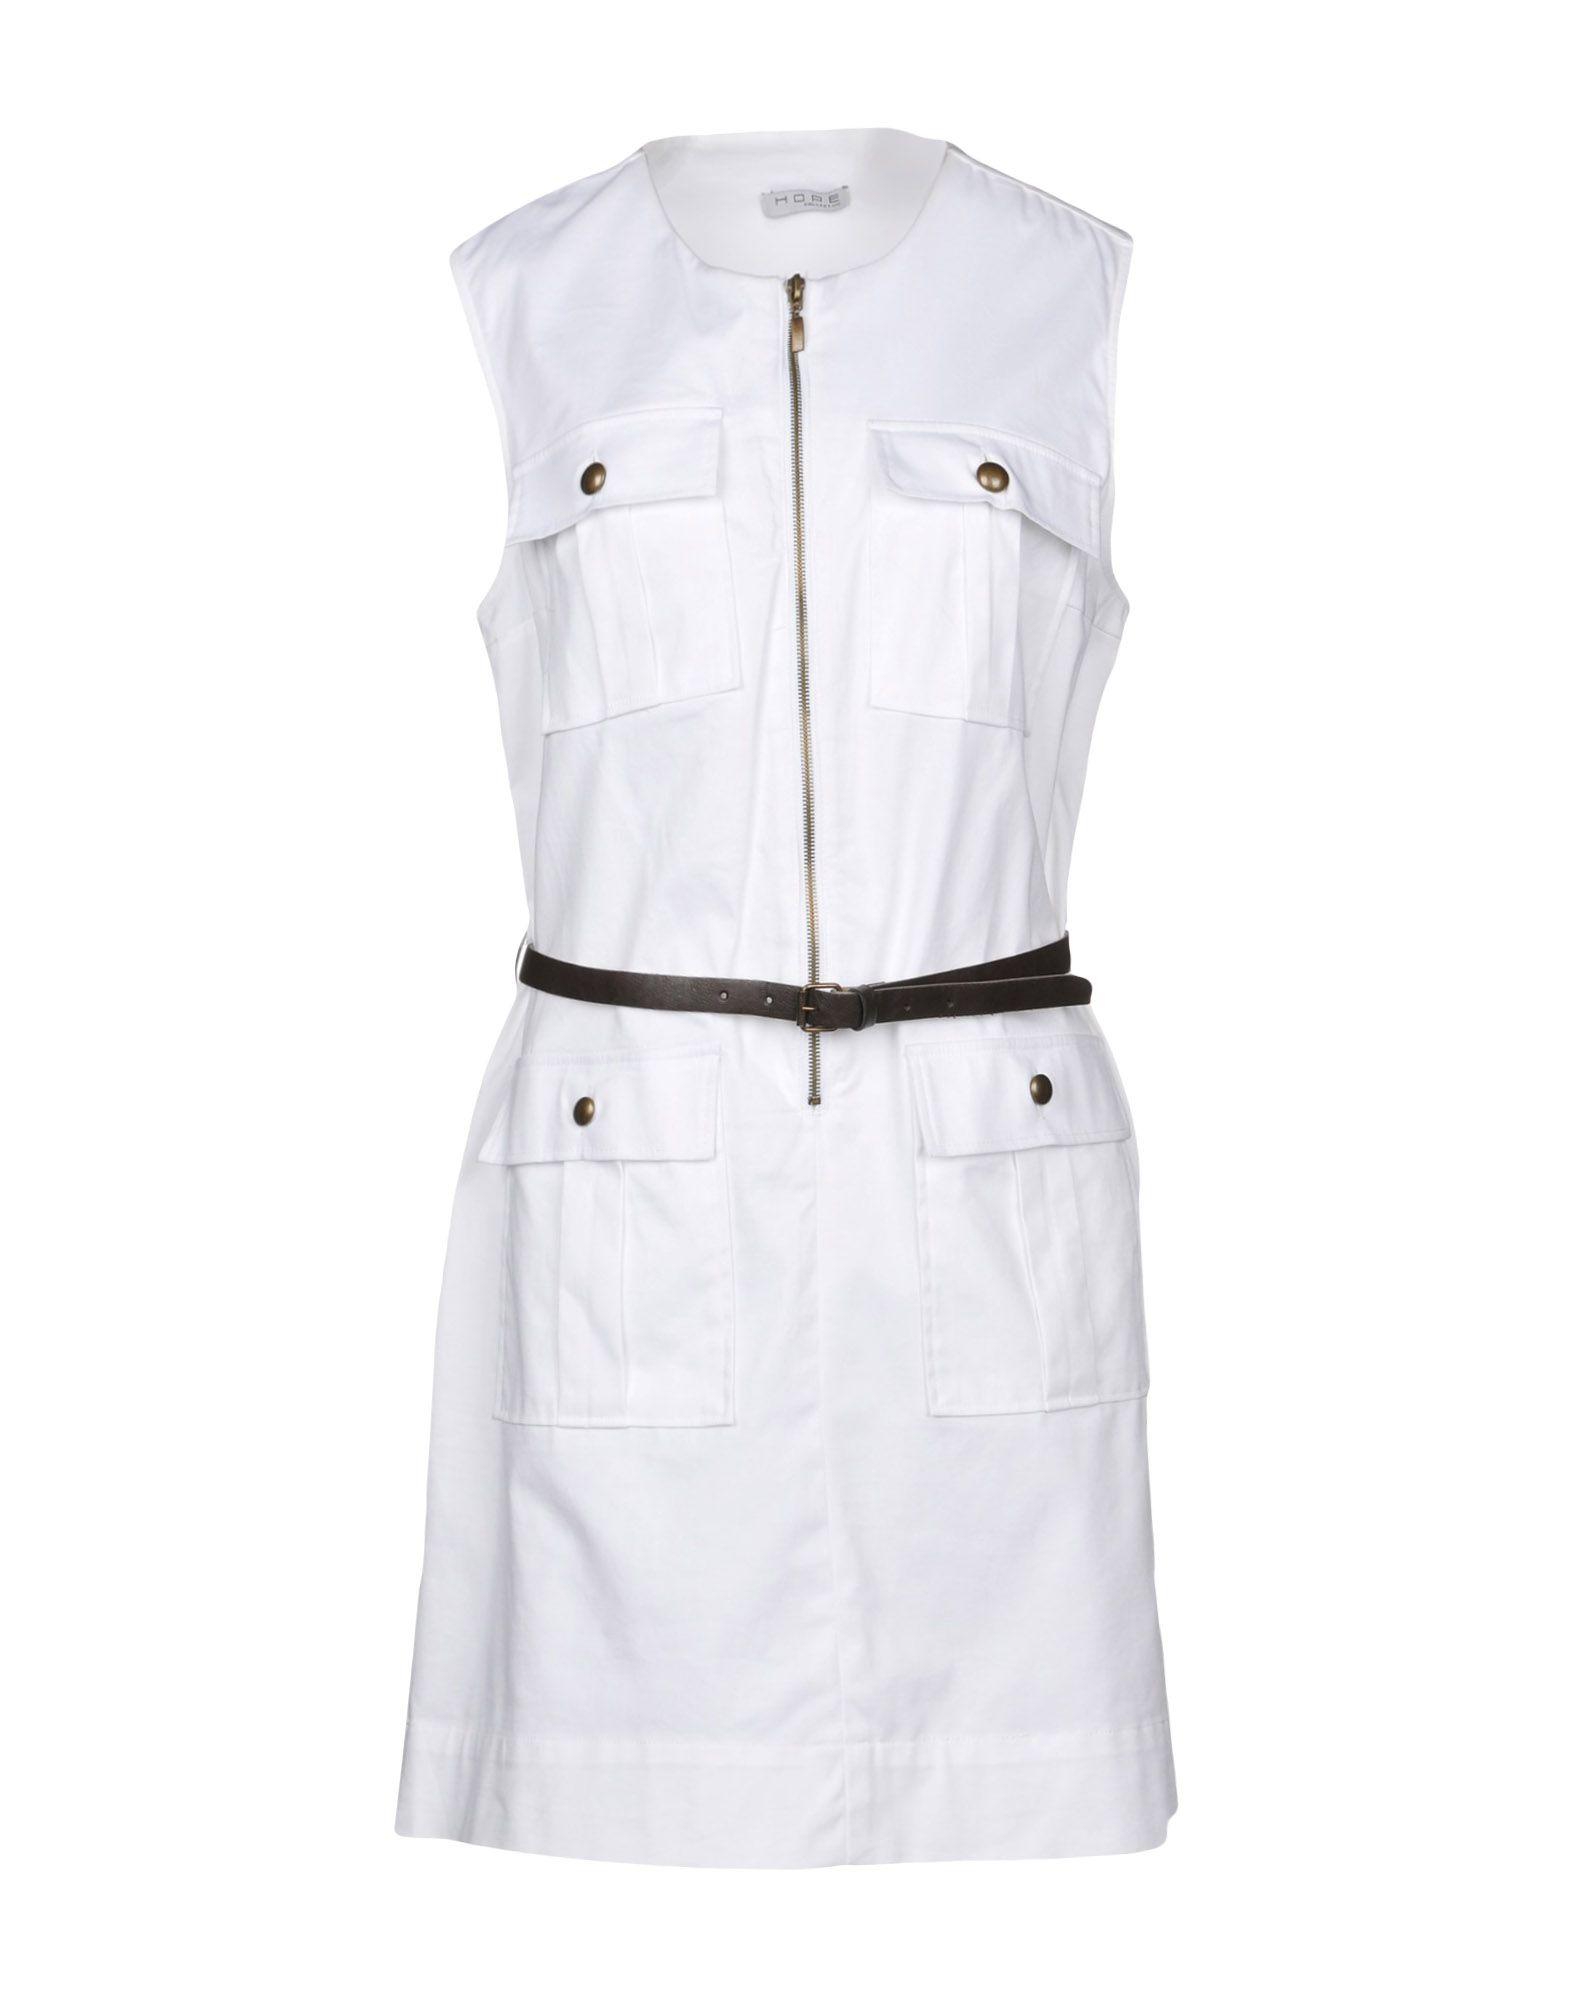 HOPE COLLECTION Короткое платье женская юбка hope 2015 midi saia 5846